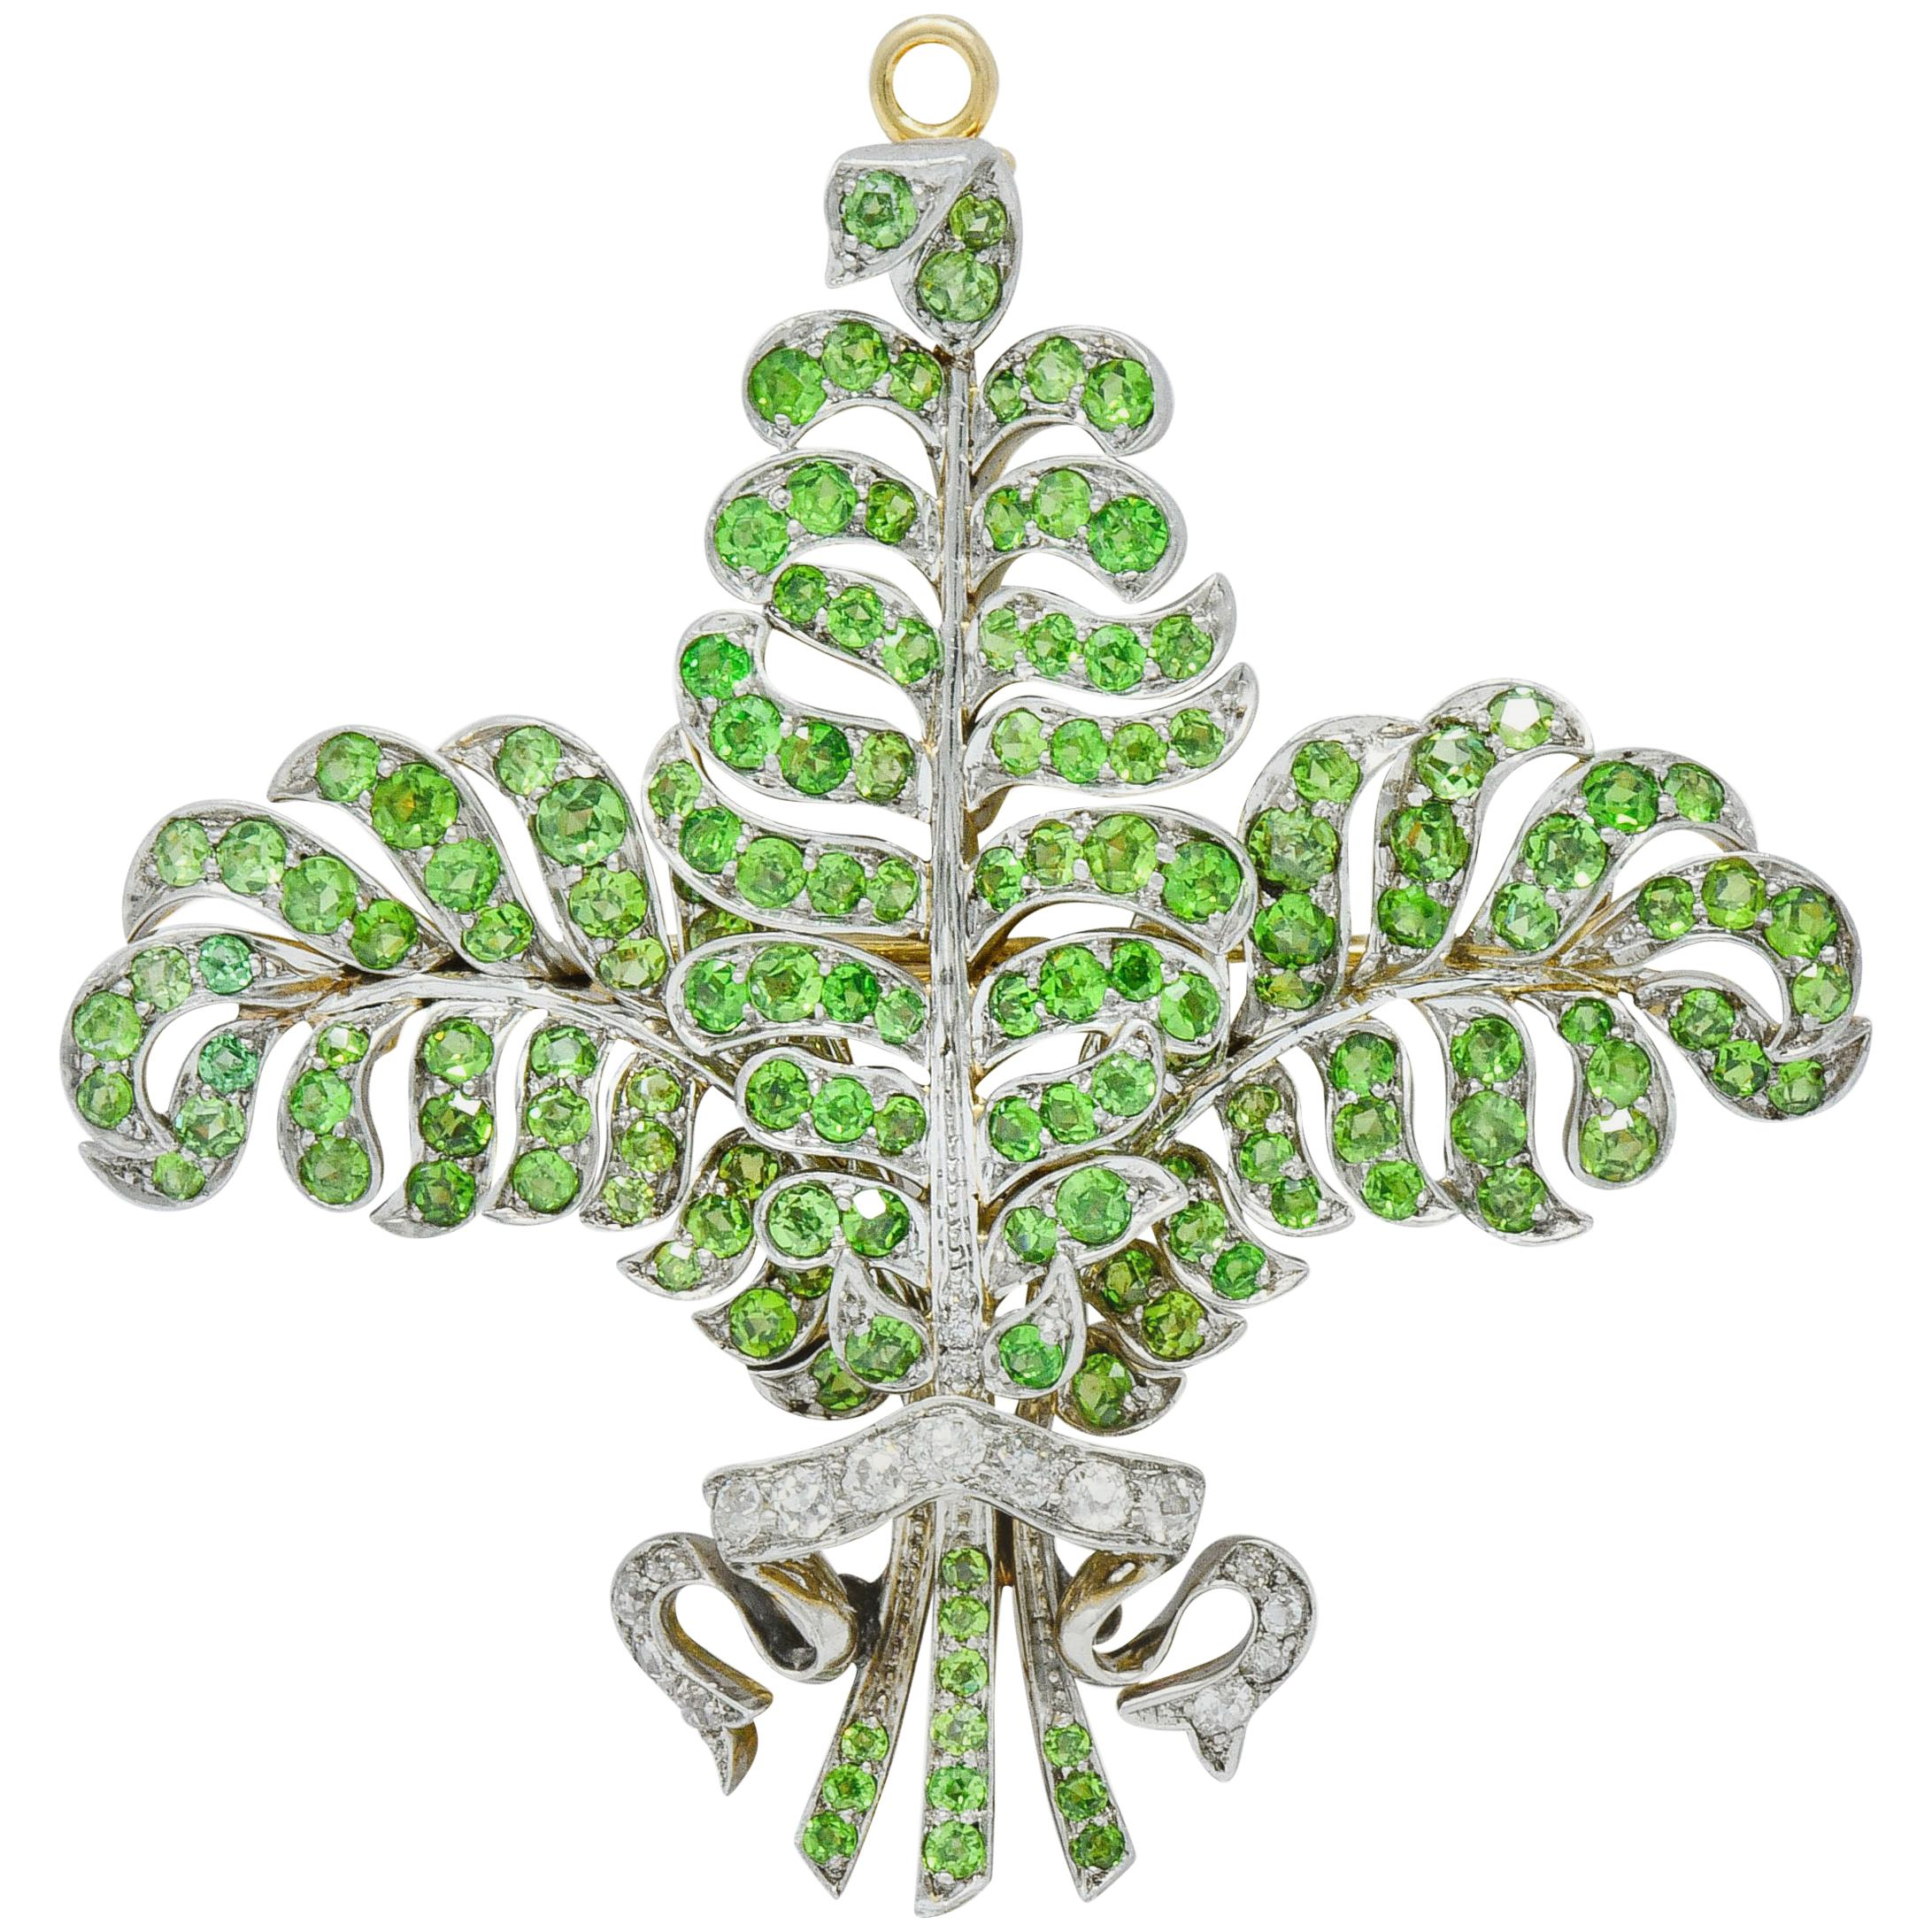 T.B. Starr Demantoid Garnet Diamond Platinum 18 Karat Gold Edwardian Pendant Pin